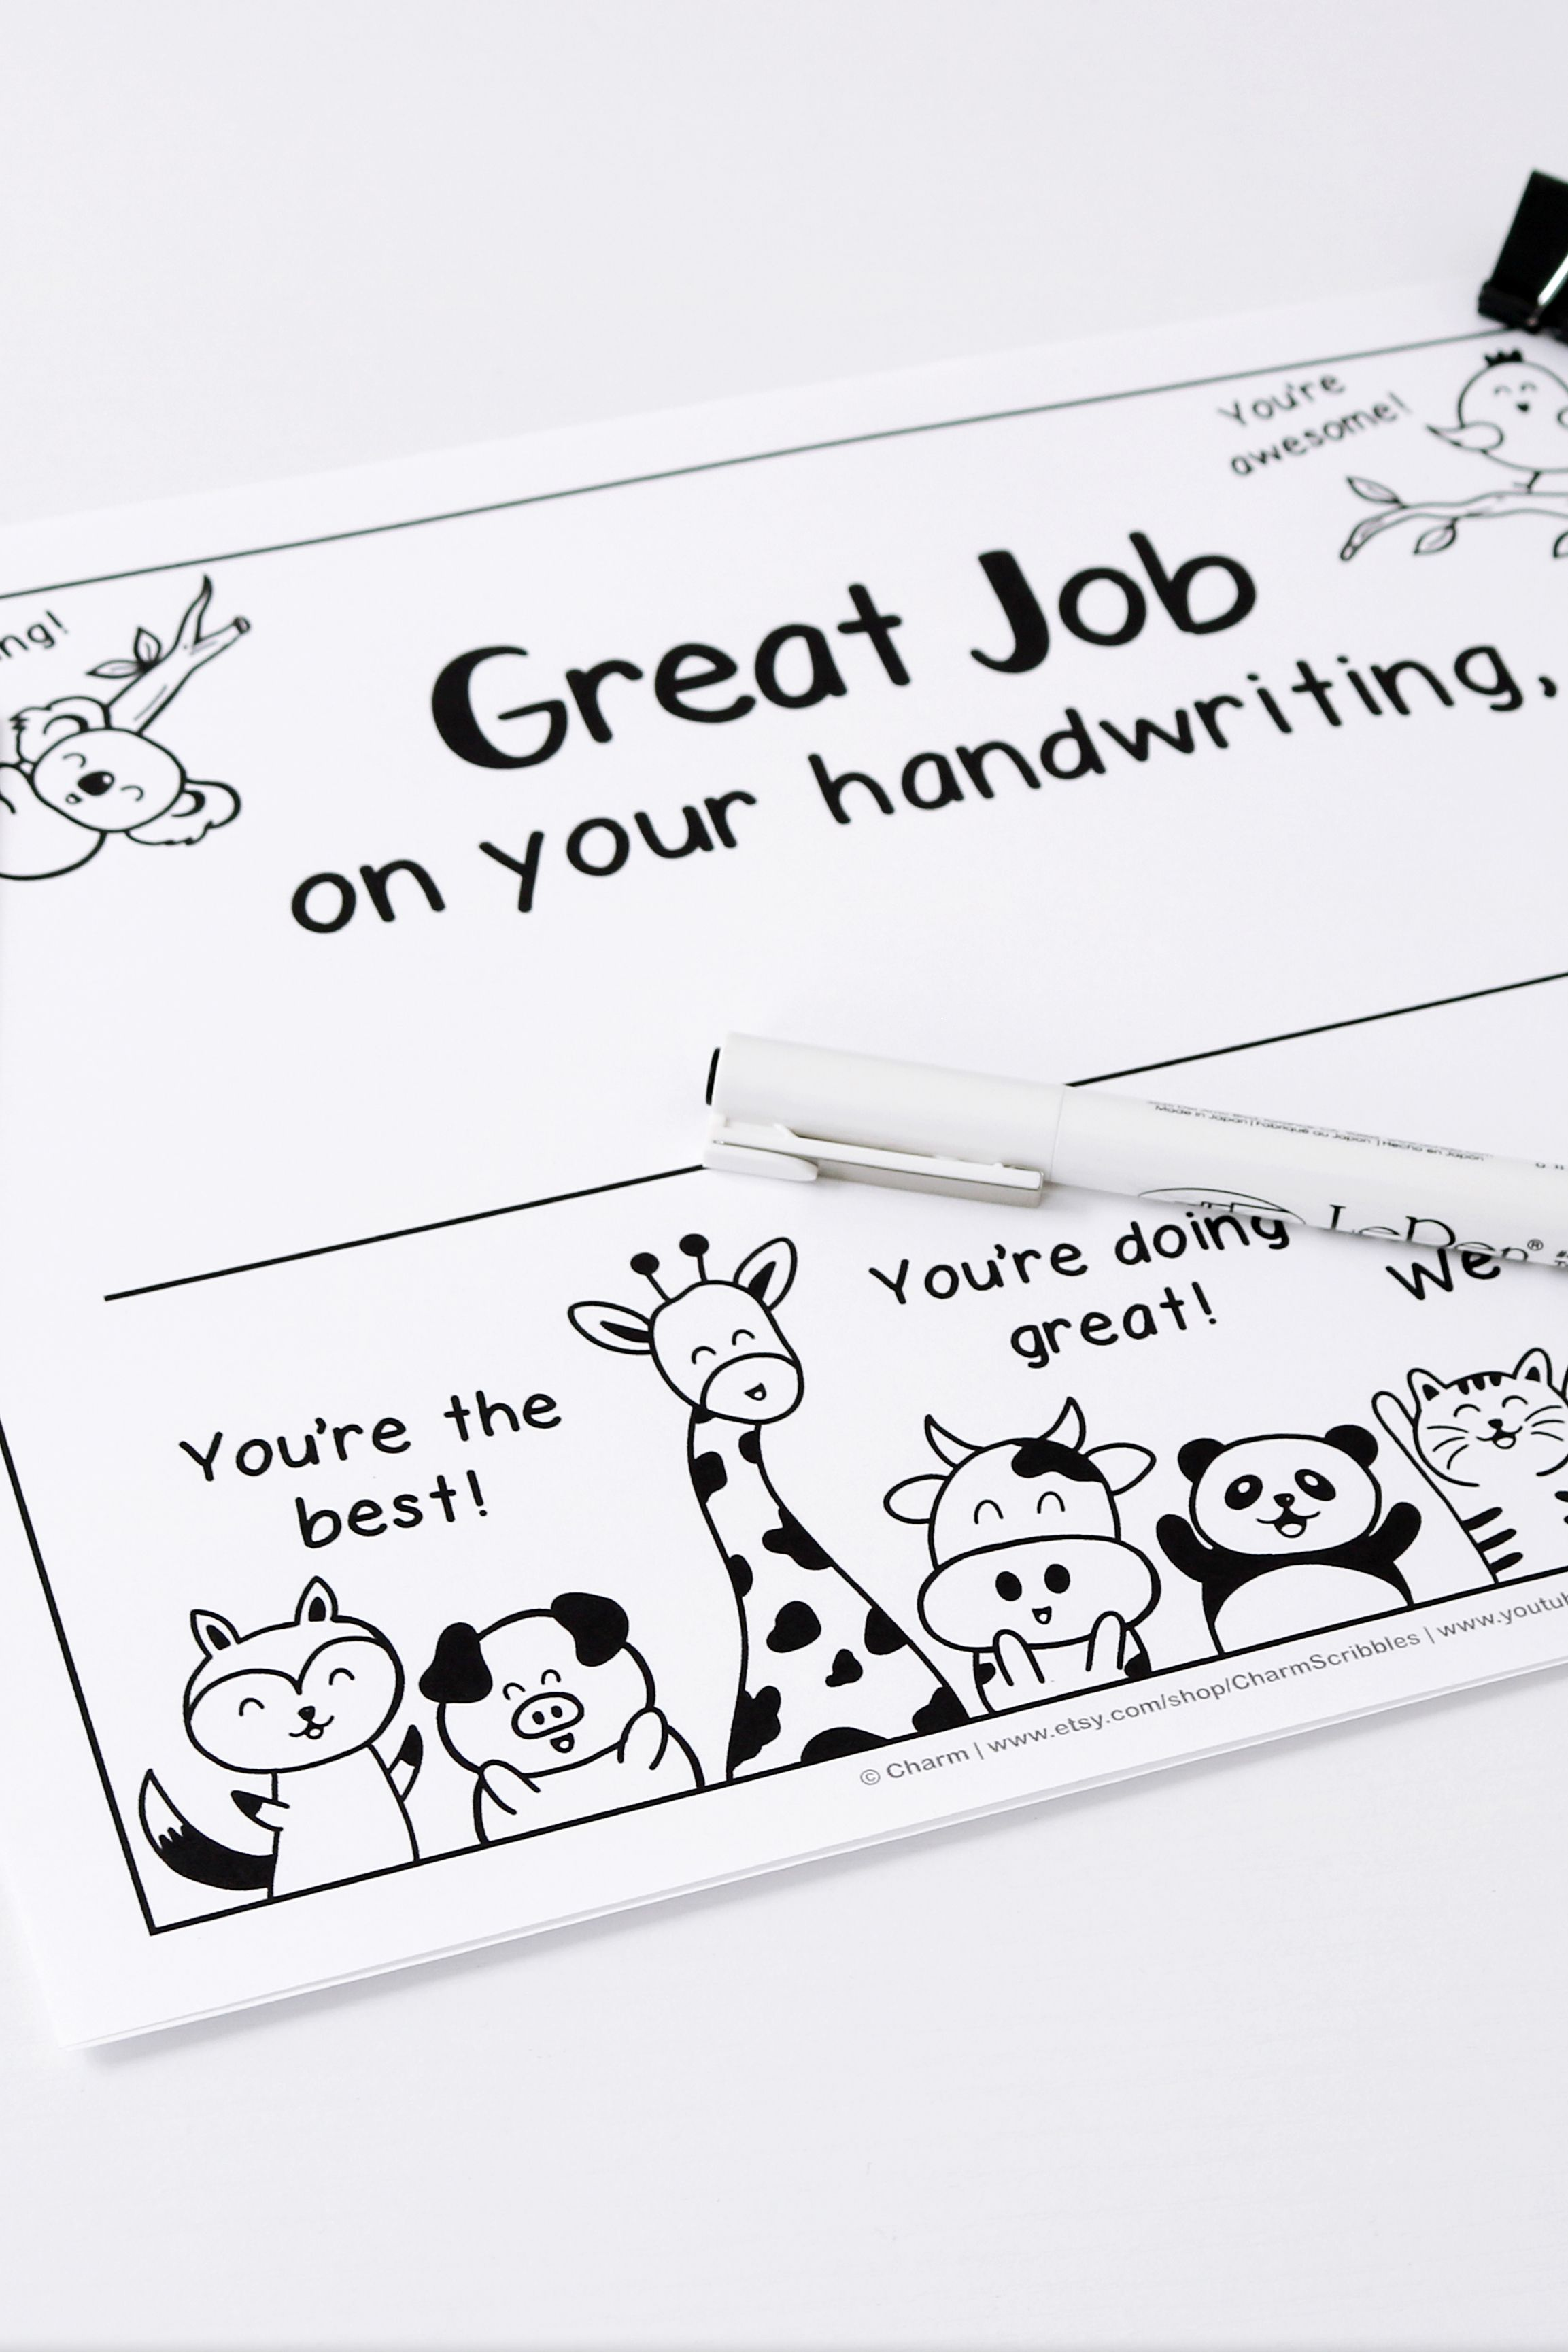 Printable Handwriting Certificate Handwriting Worksheets For Kids Handwriting Worksheets For Kids Worksheets For Kids Handwriting Worksheets [ 3459 x 2306 Pixel ]